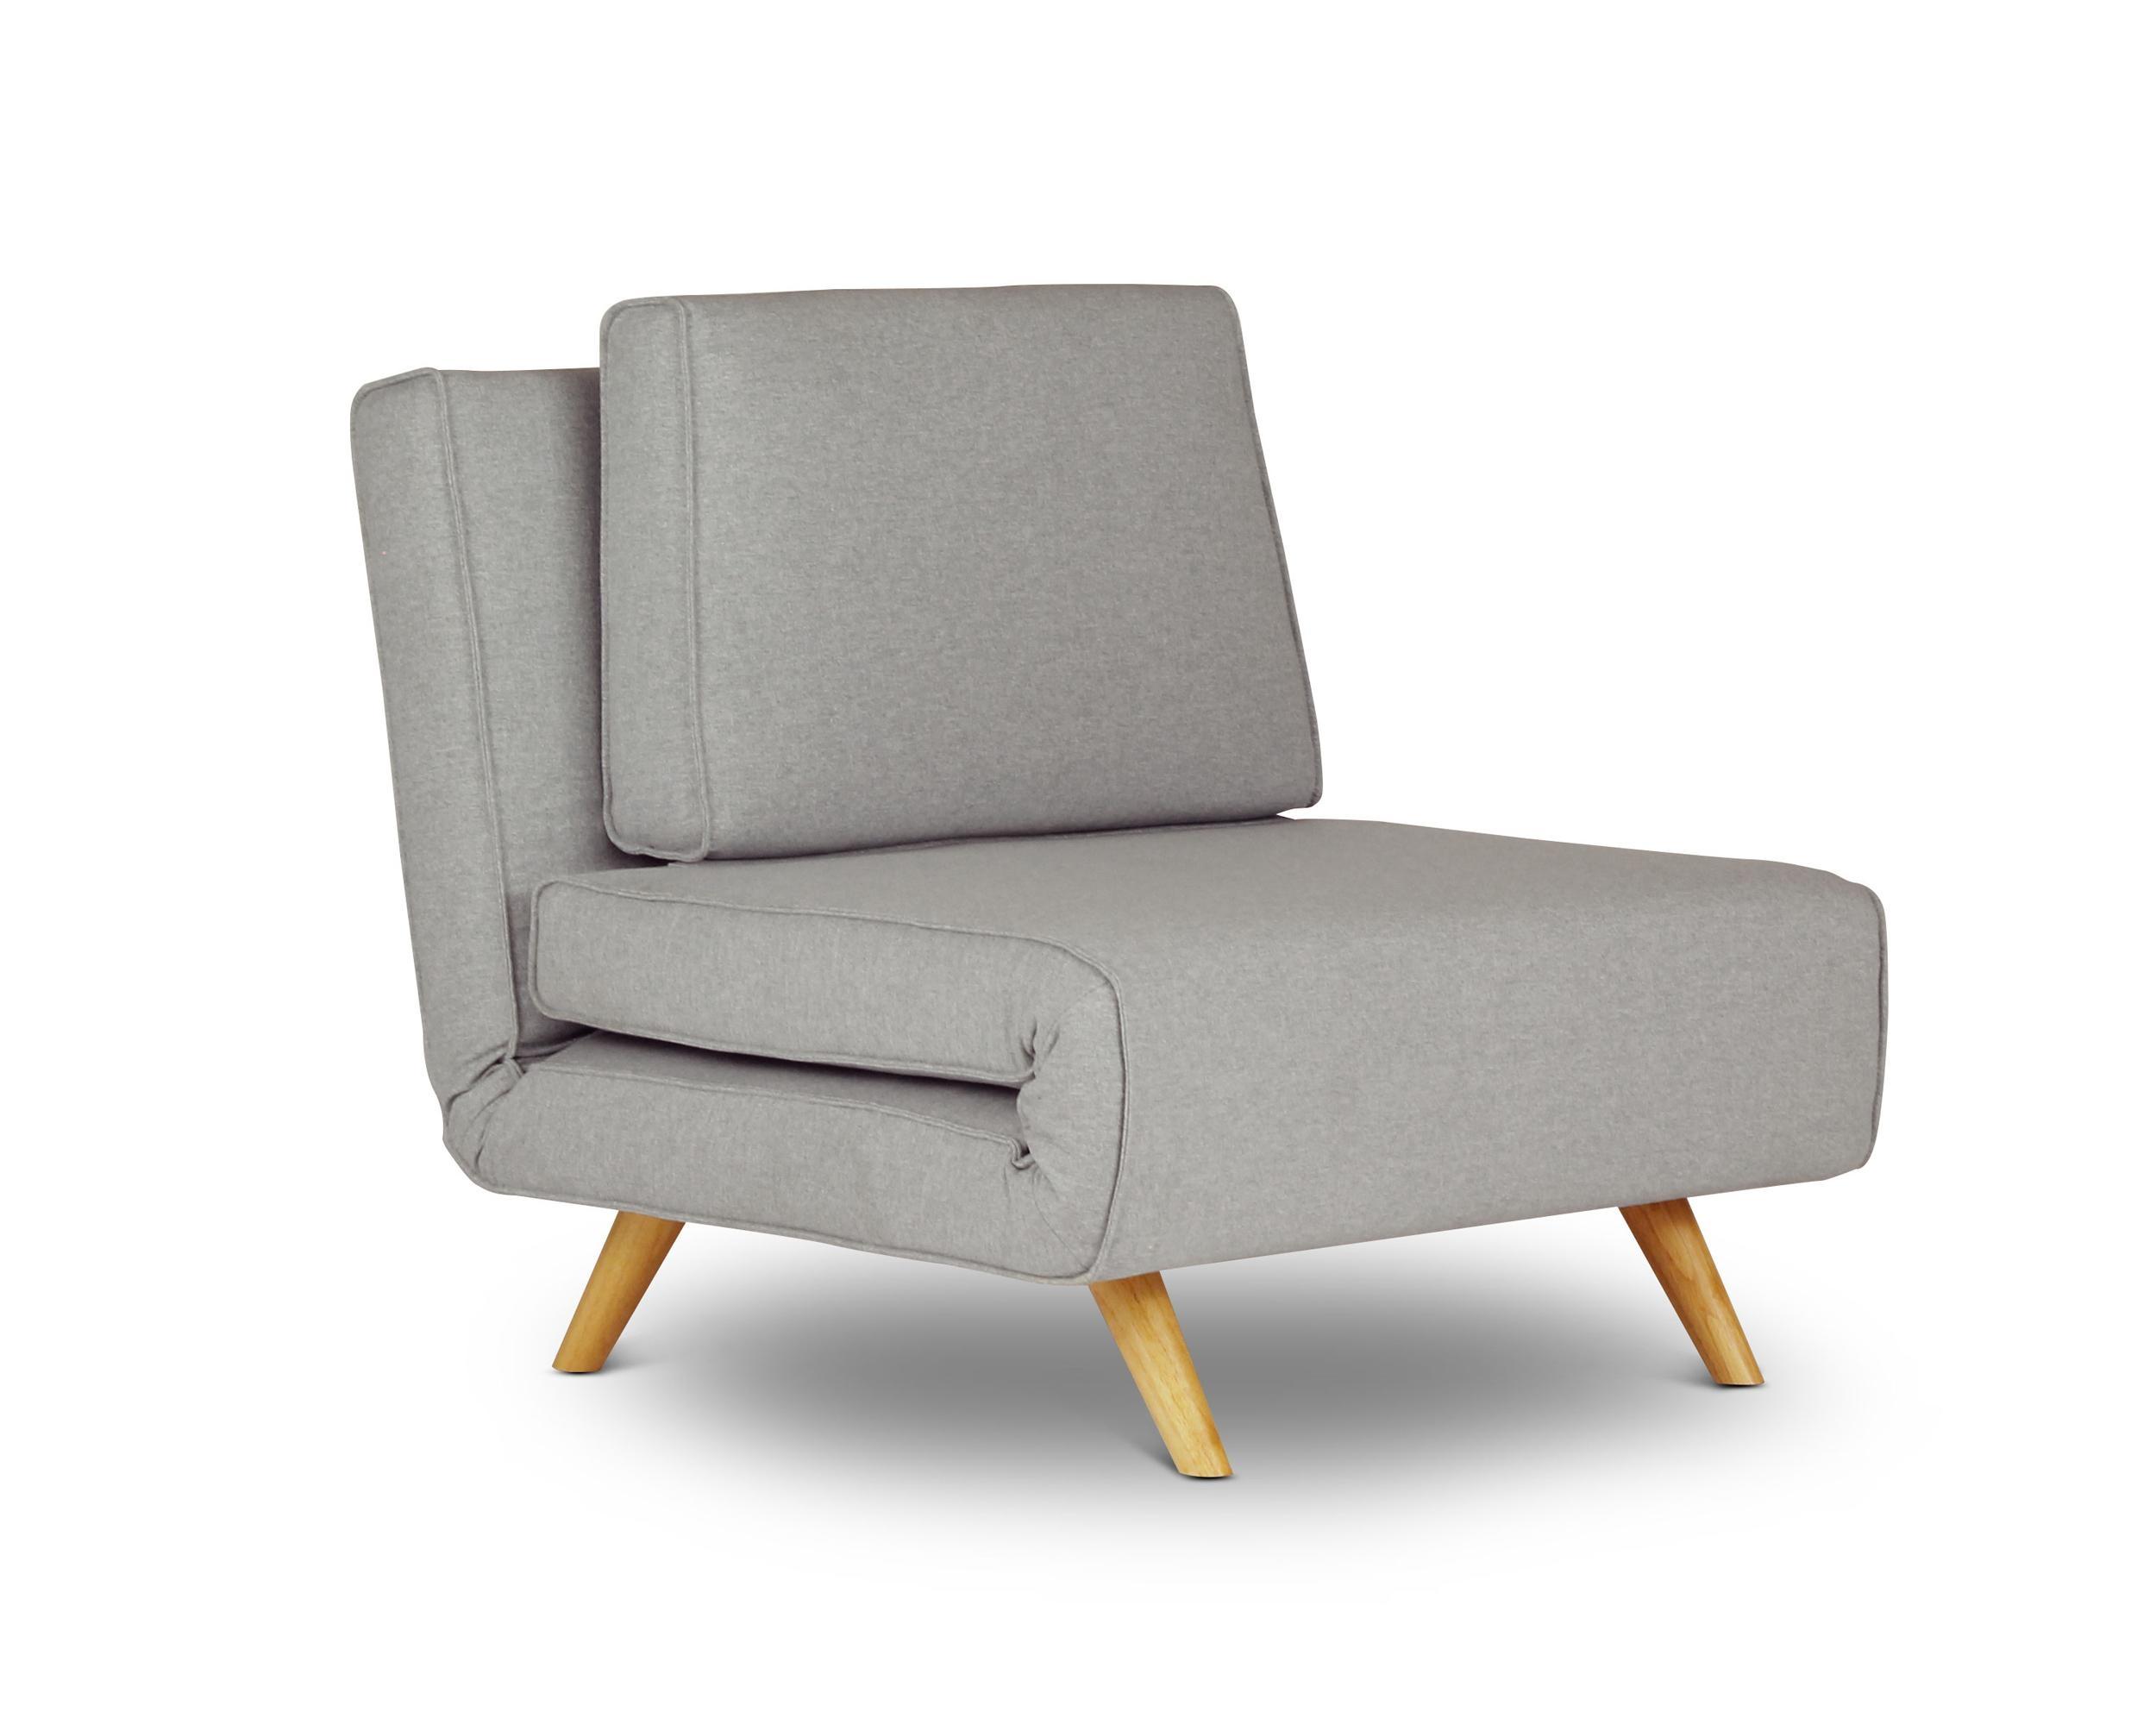 stylish and elegant single sofa bed - pickndecor throughout single chair sofa UOVNEYQ